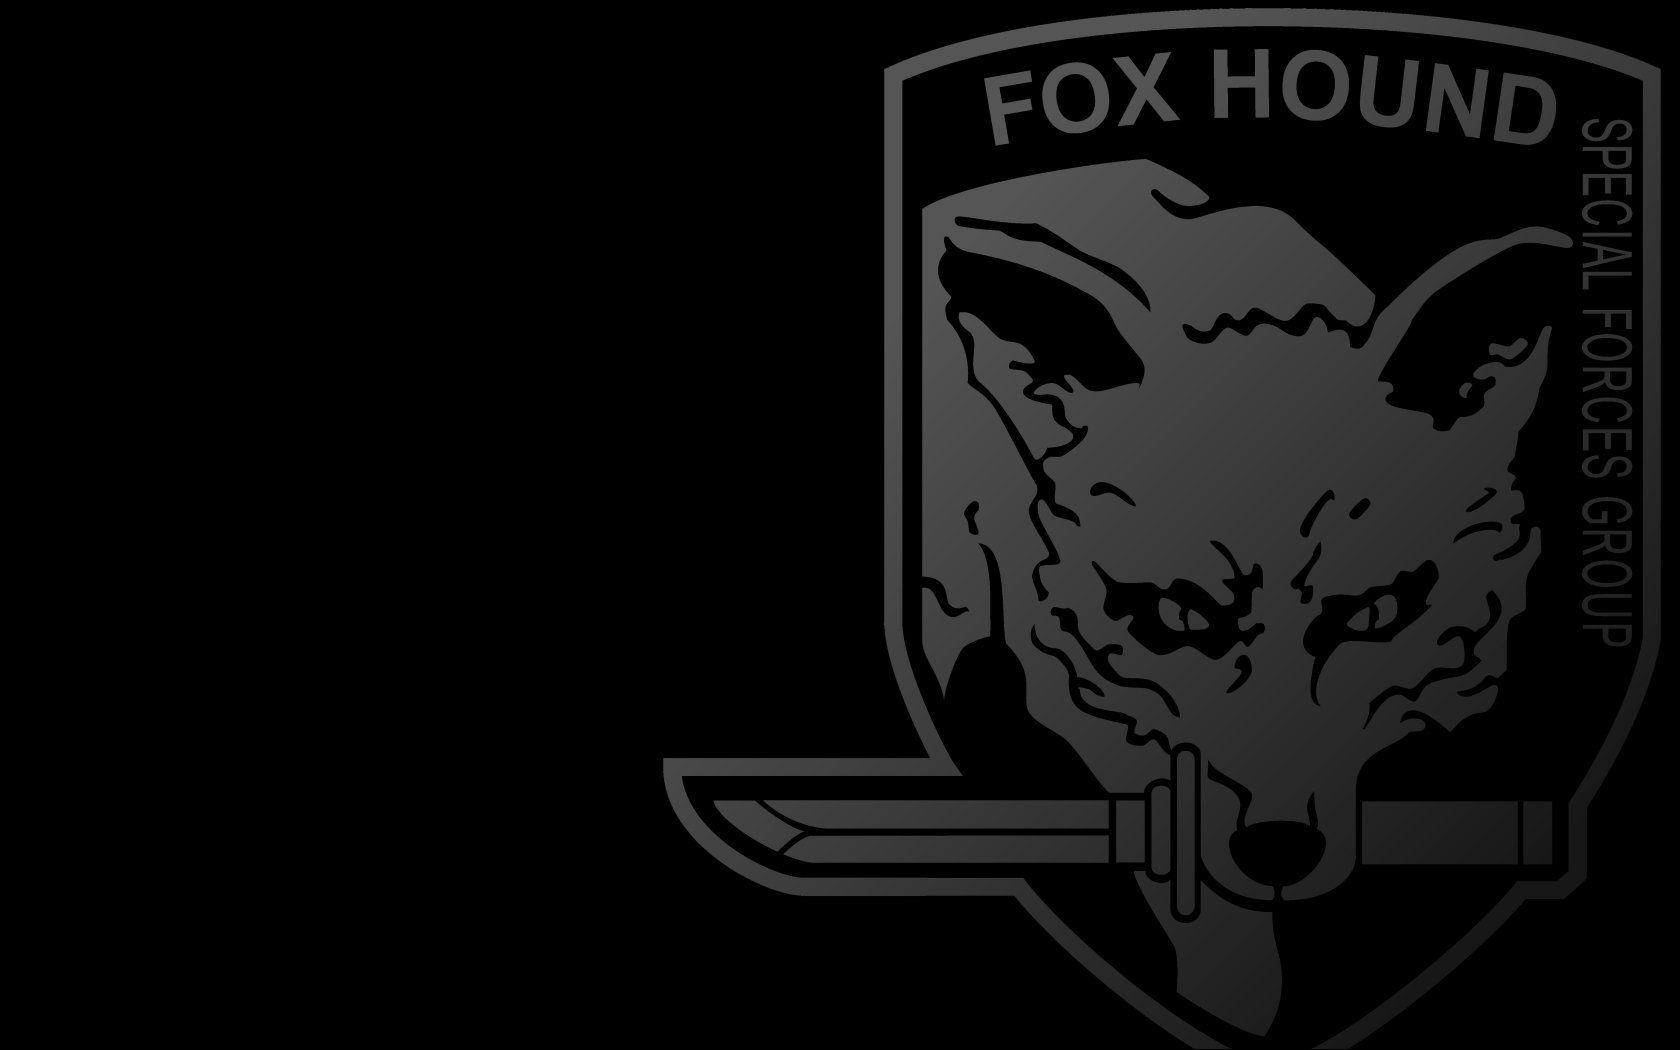 Fox Hound Wallpaper The Fox And The Hound Metal Gear Cartoon Wallpaper Hd